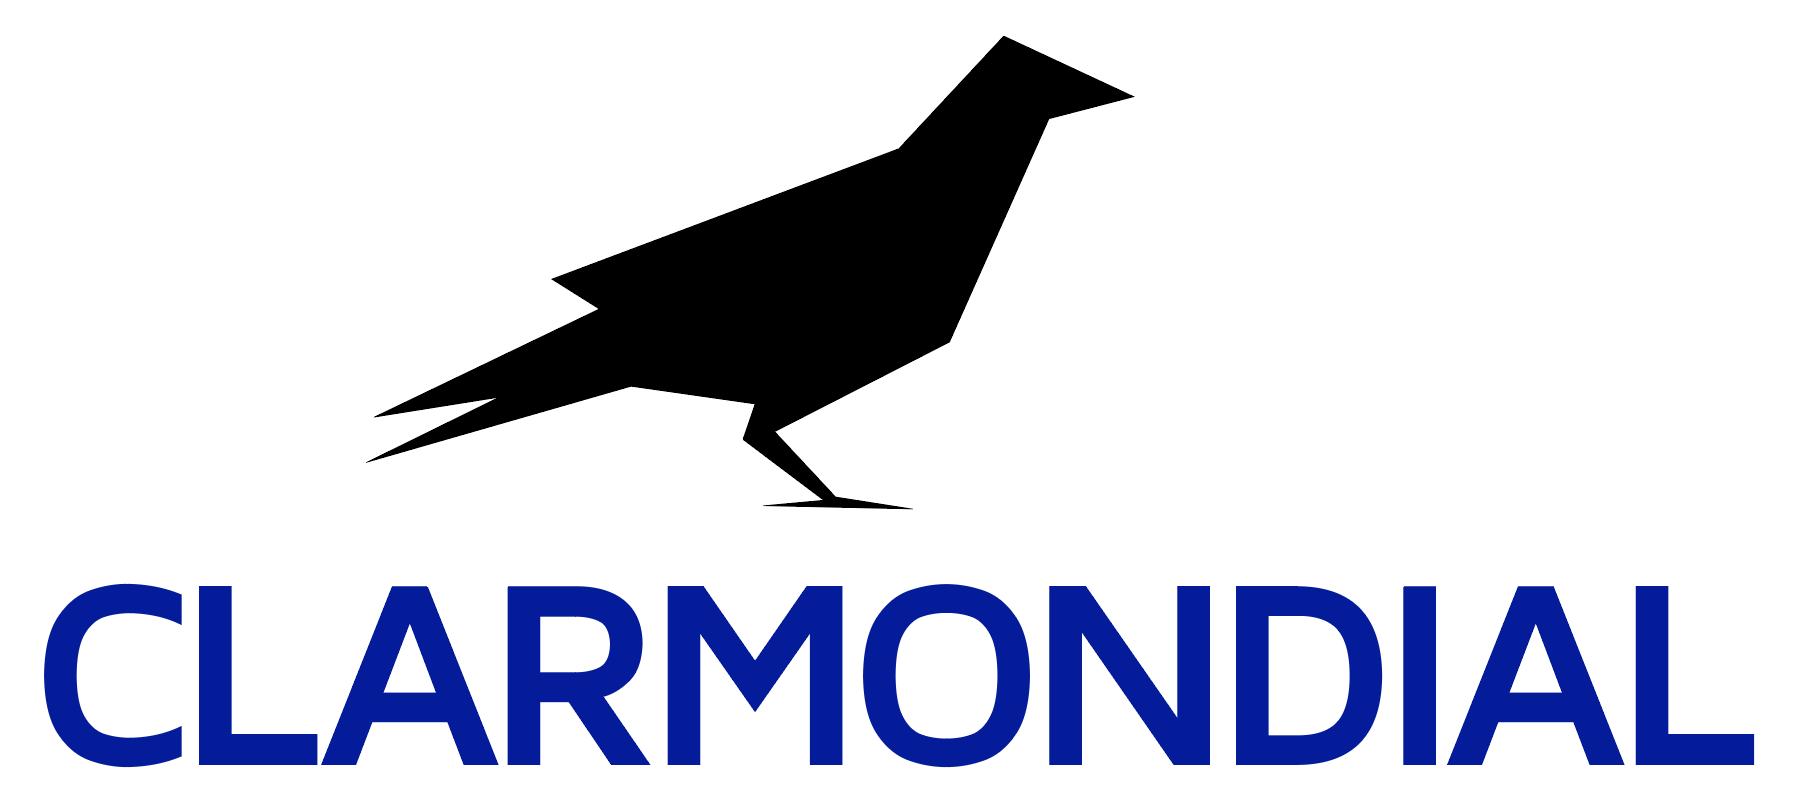 Clarmondial logo.png